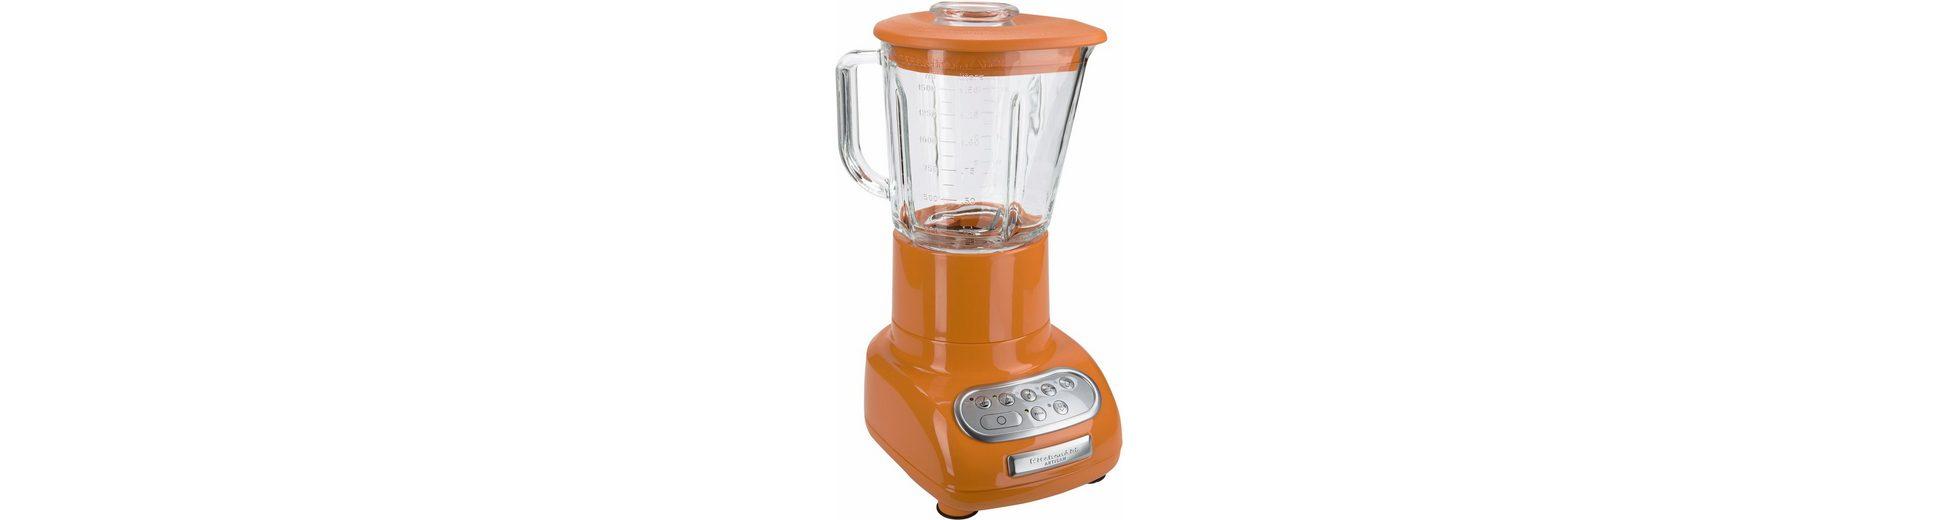 KitchenAid Standmixer Artisan 5KSB5553ETG, 550 Watt, tangerine